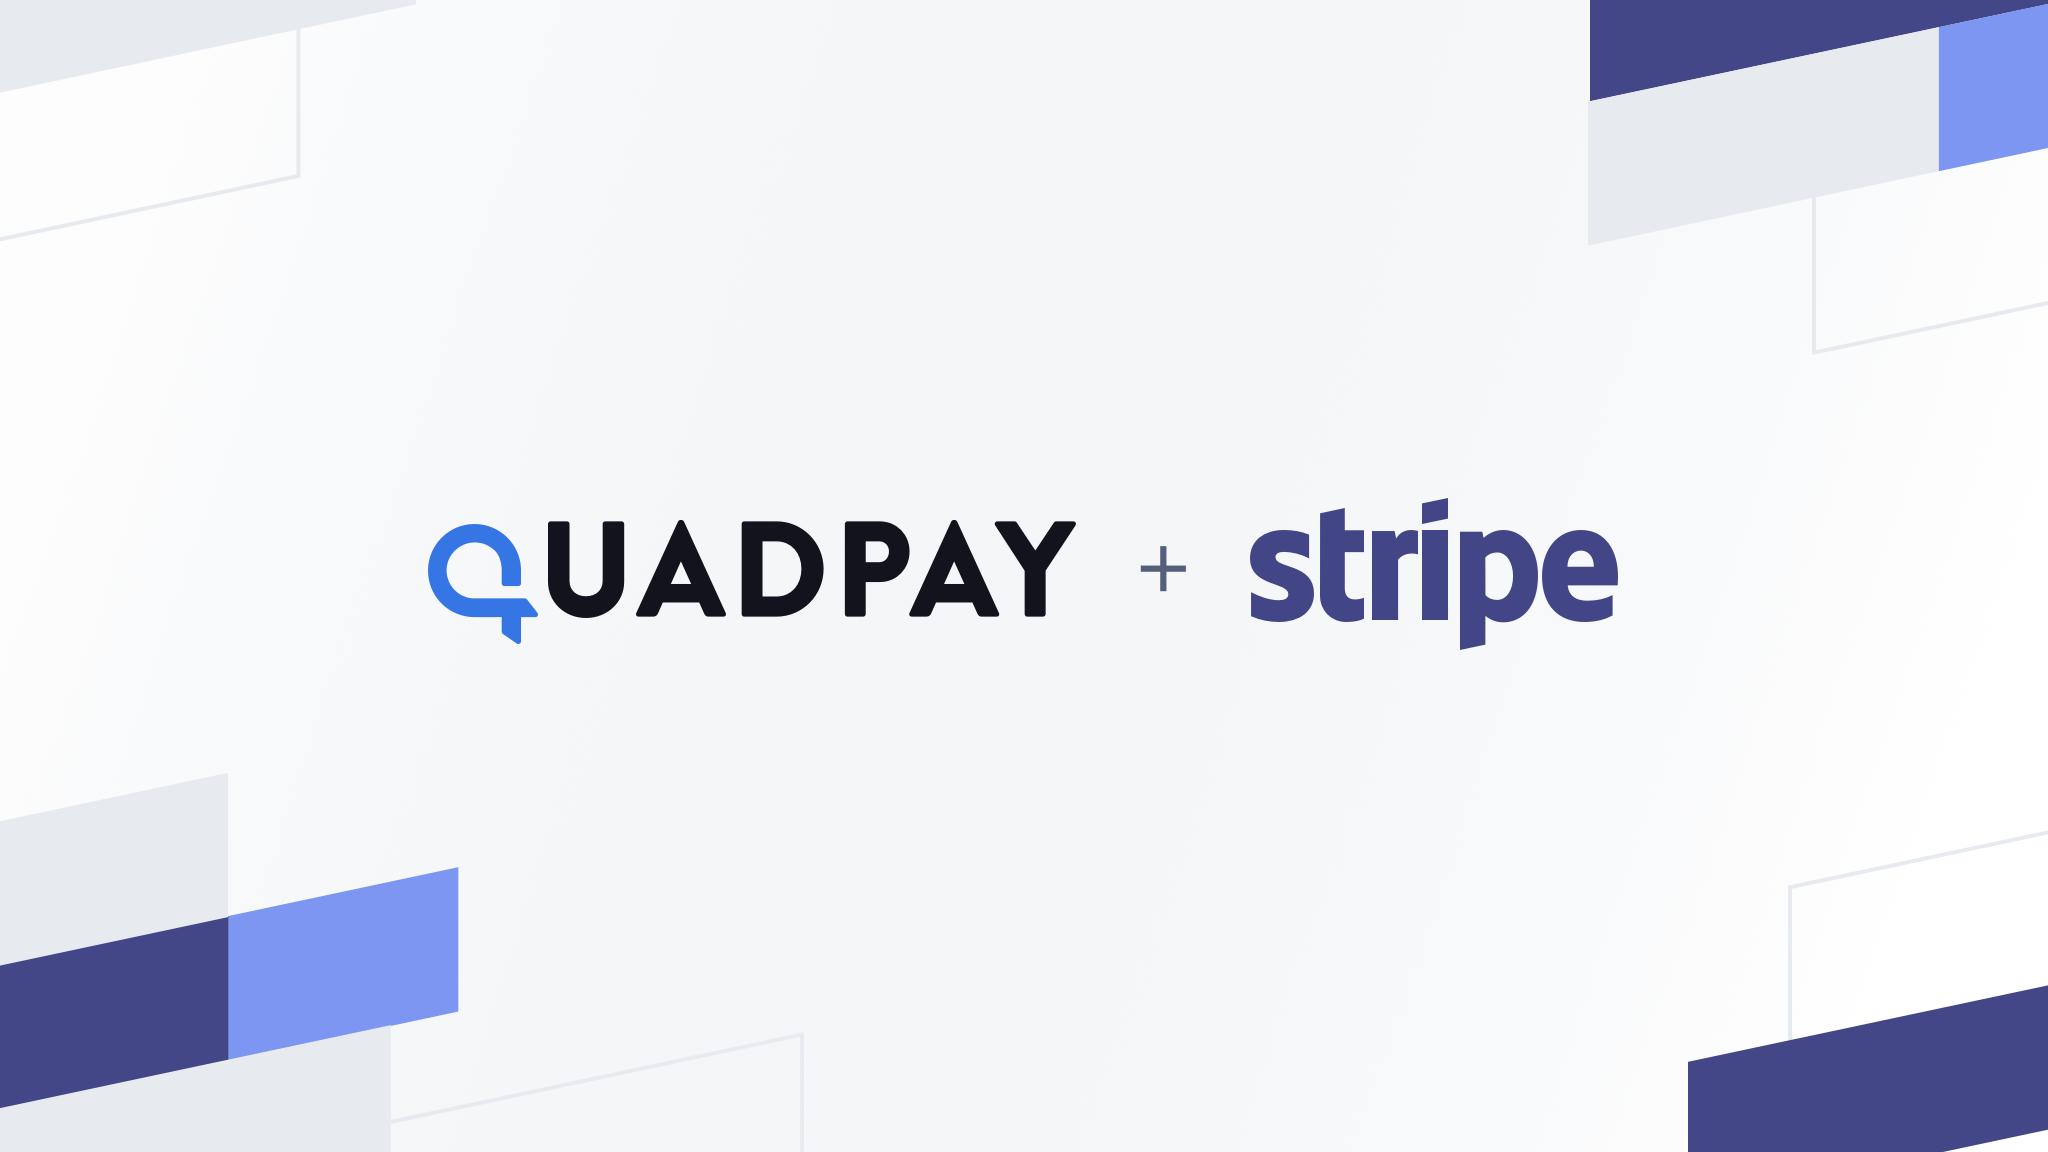 quadpay + stripe logos